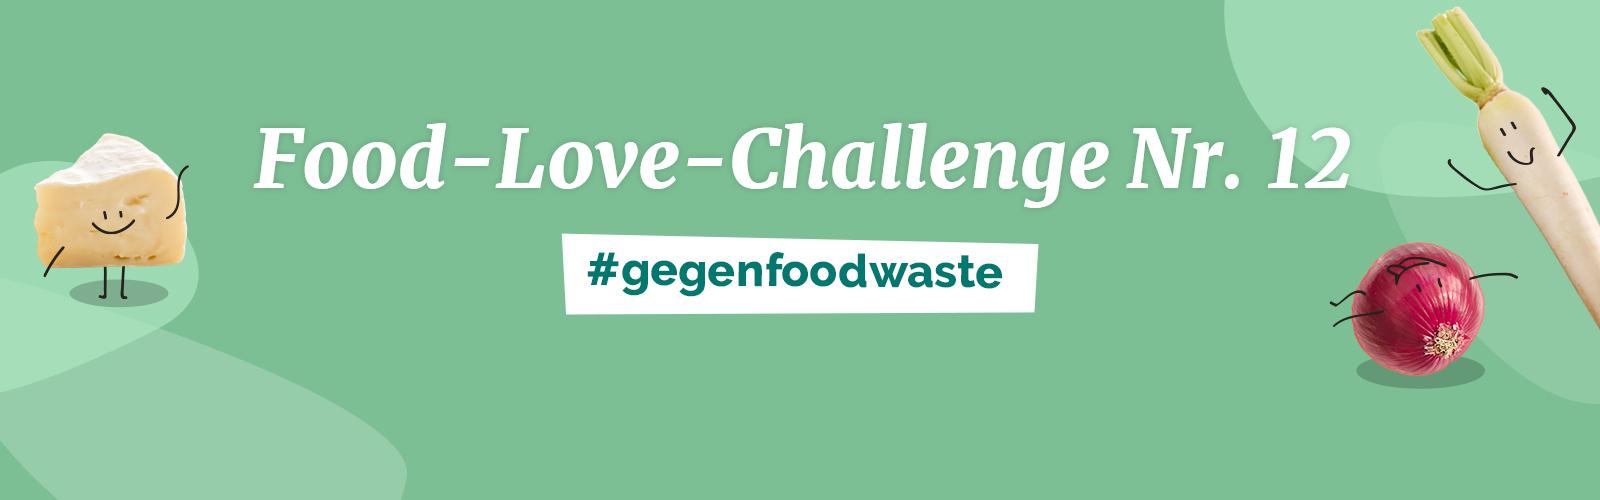 Food Love Challenge Nr. 12